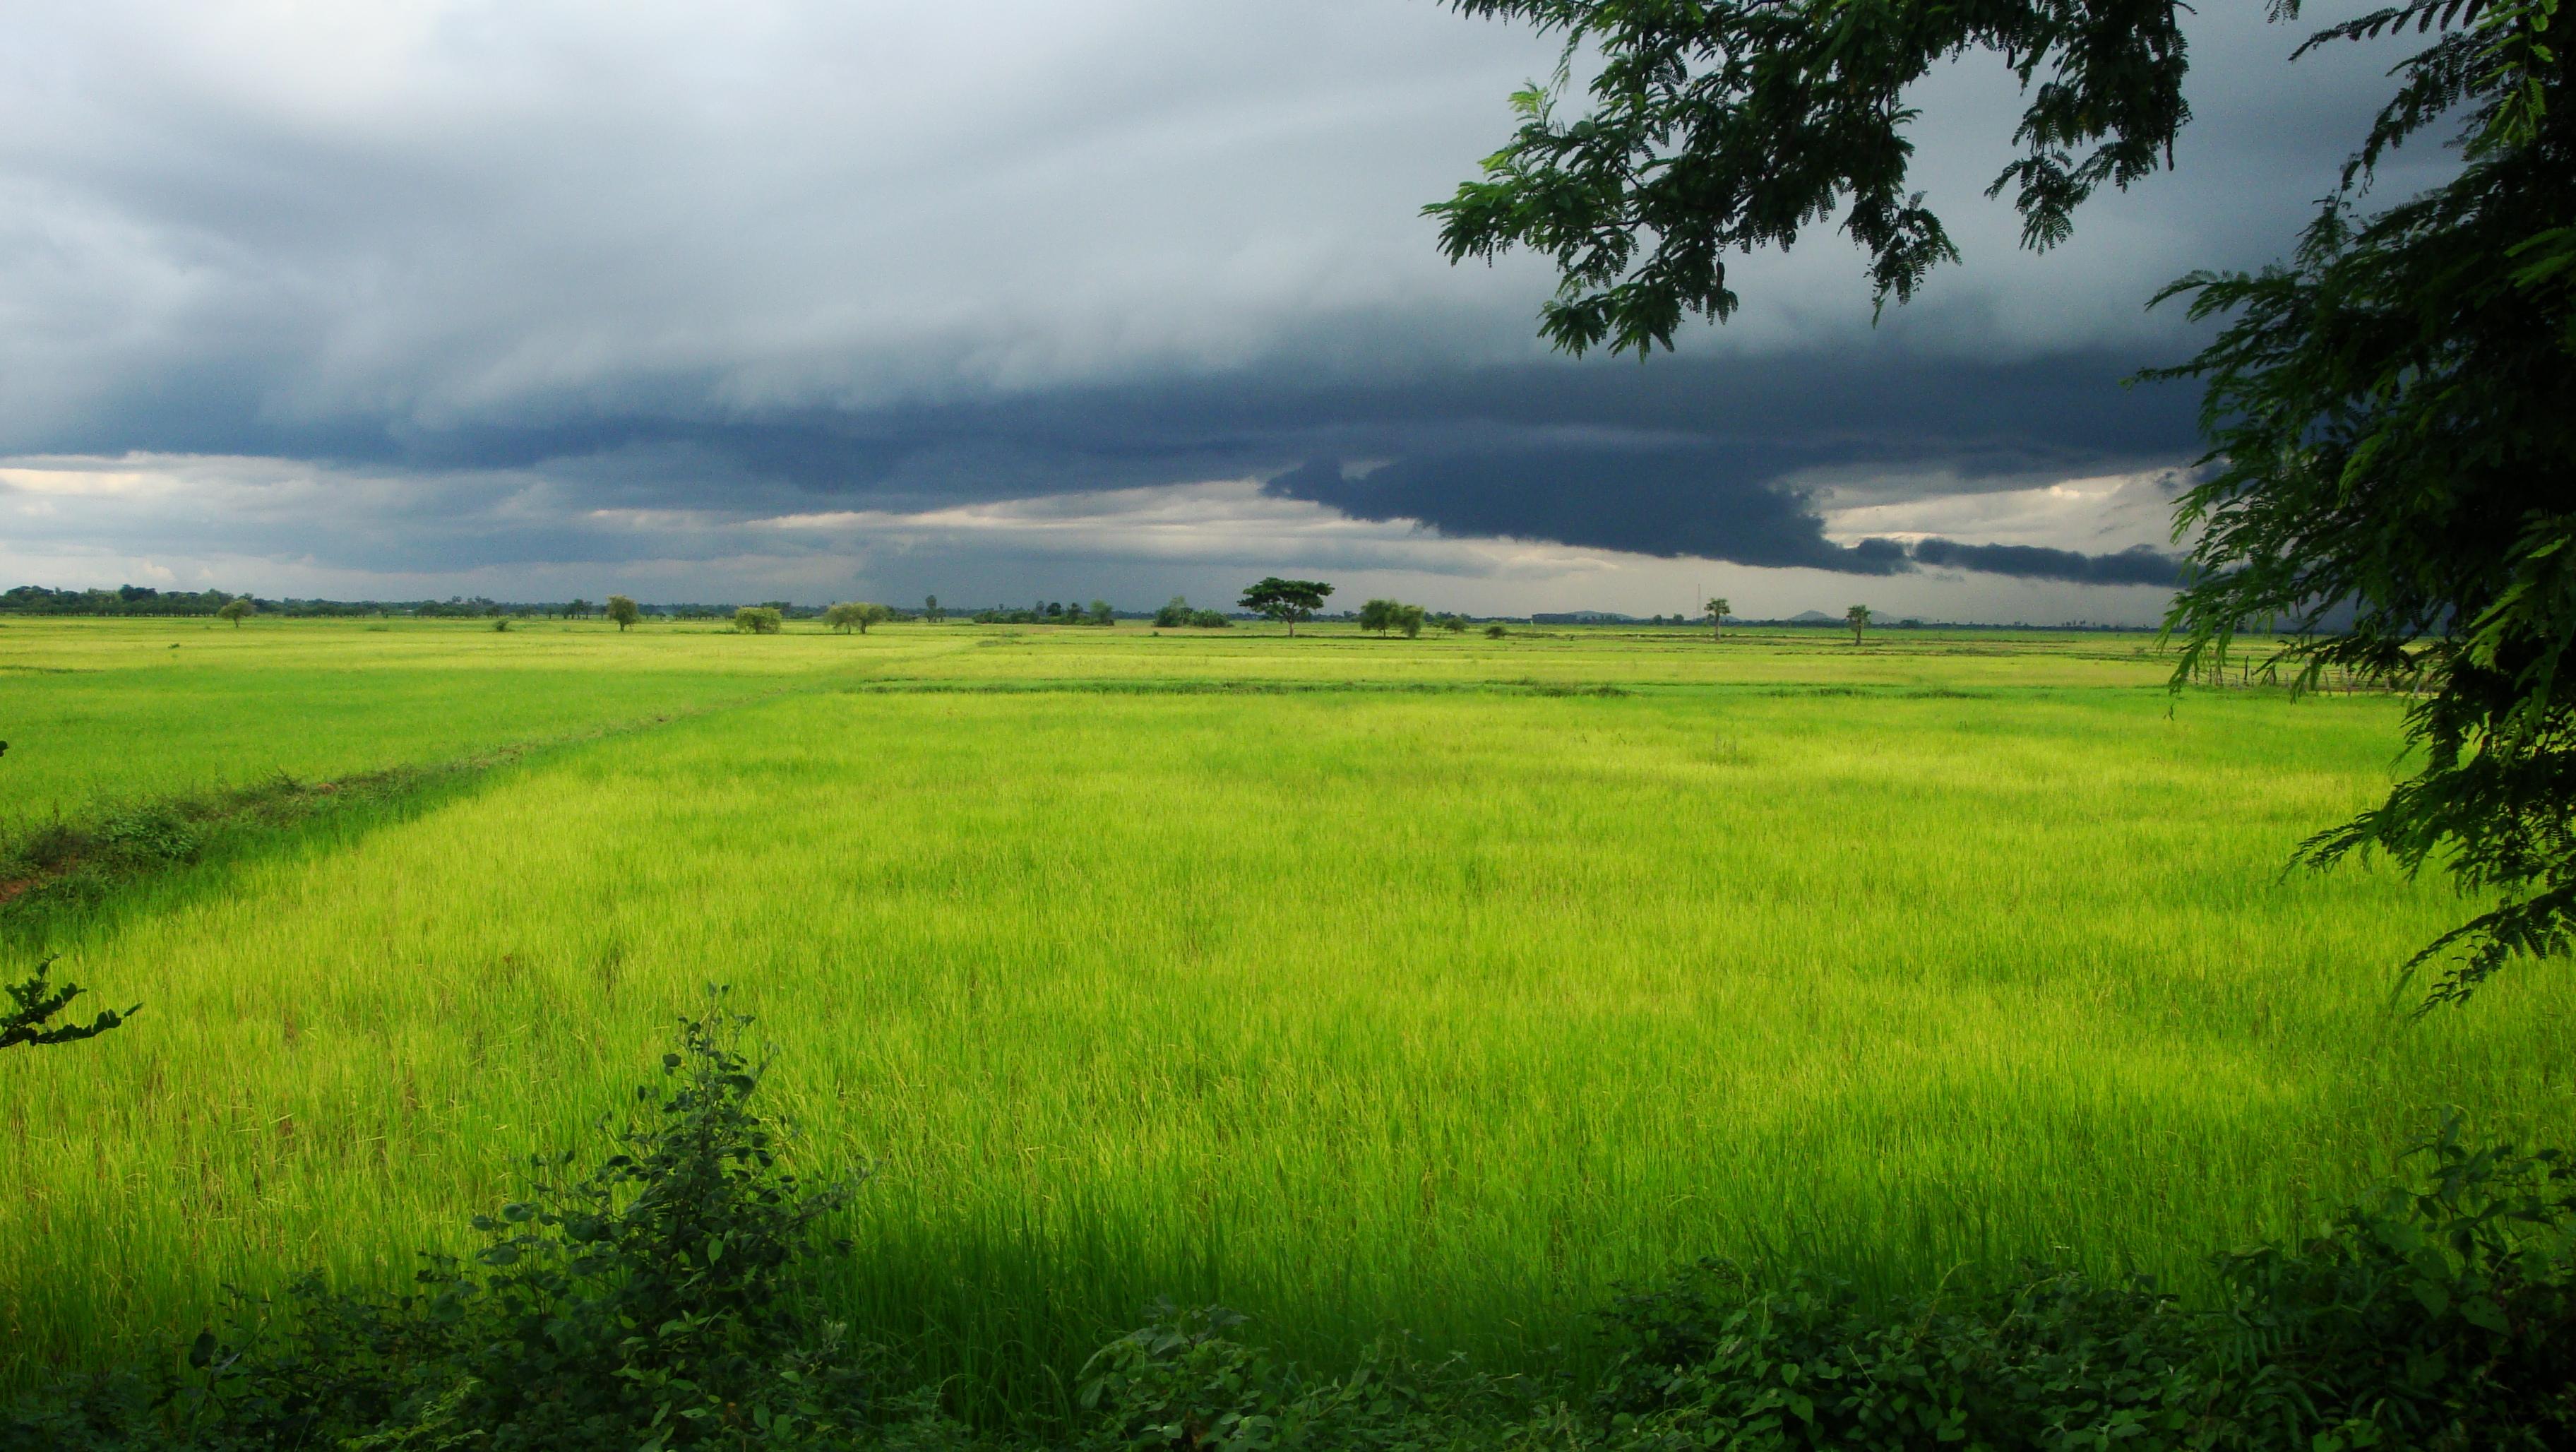 Cambodian Fields by xWaleedx